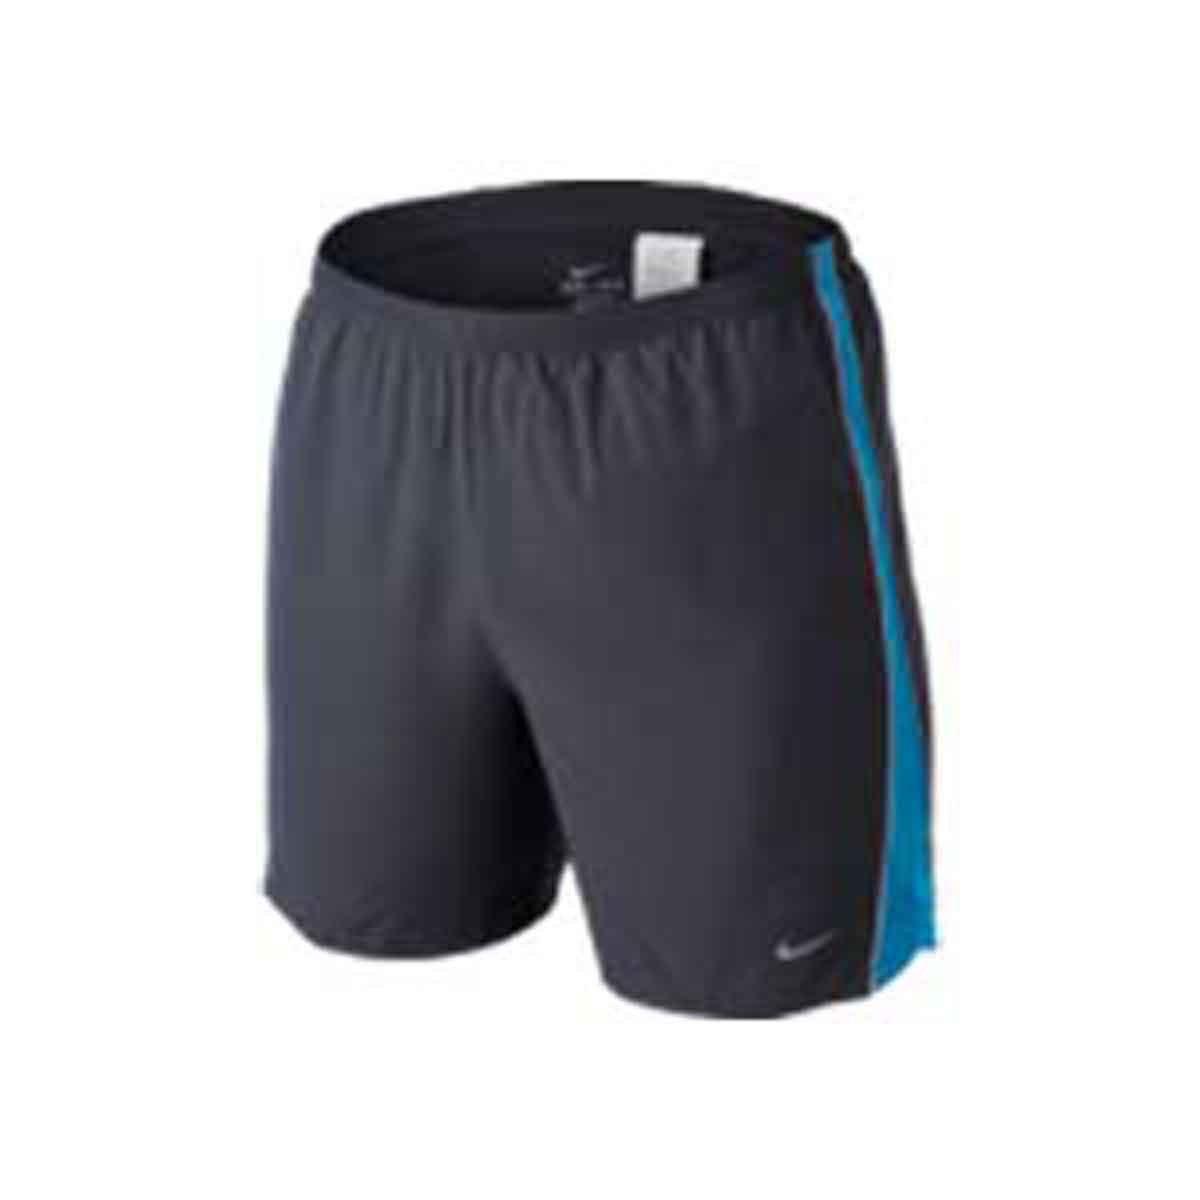 Buy Nike Men's Running Shorts Online in